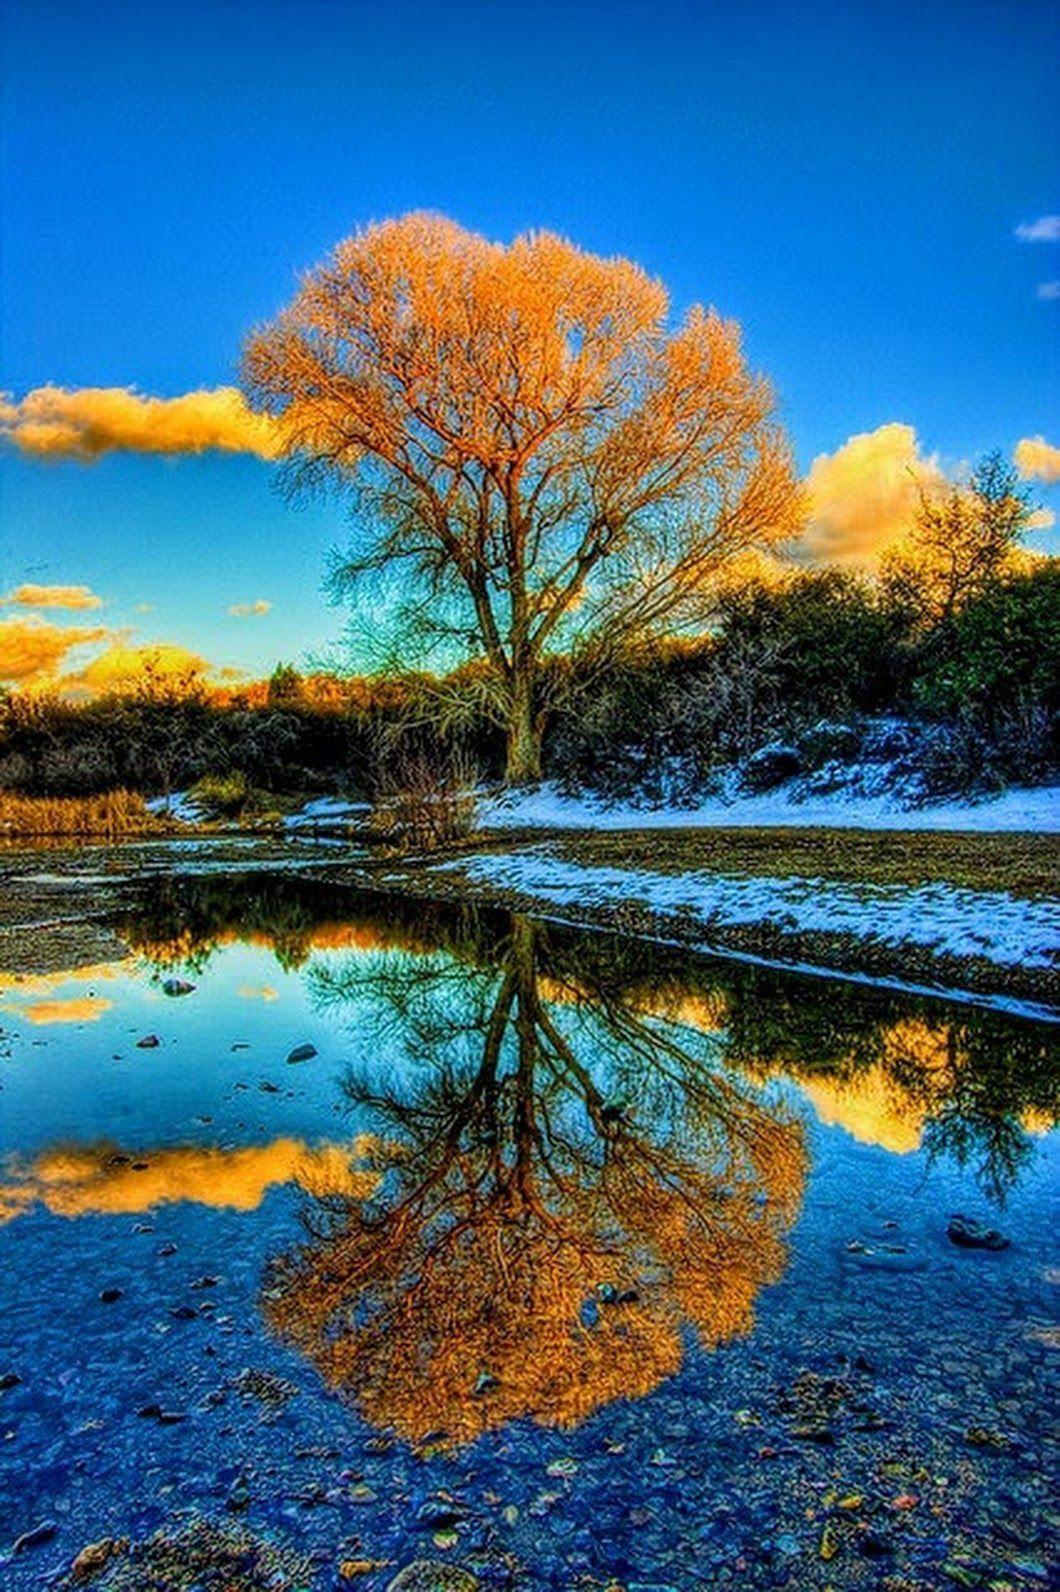 Best Sky Landscape Photography Skylandscapephotography Beautiful Photography Nature Nature Pictures Nature Photography